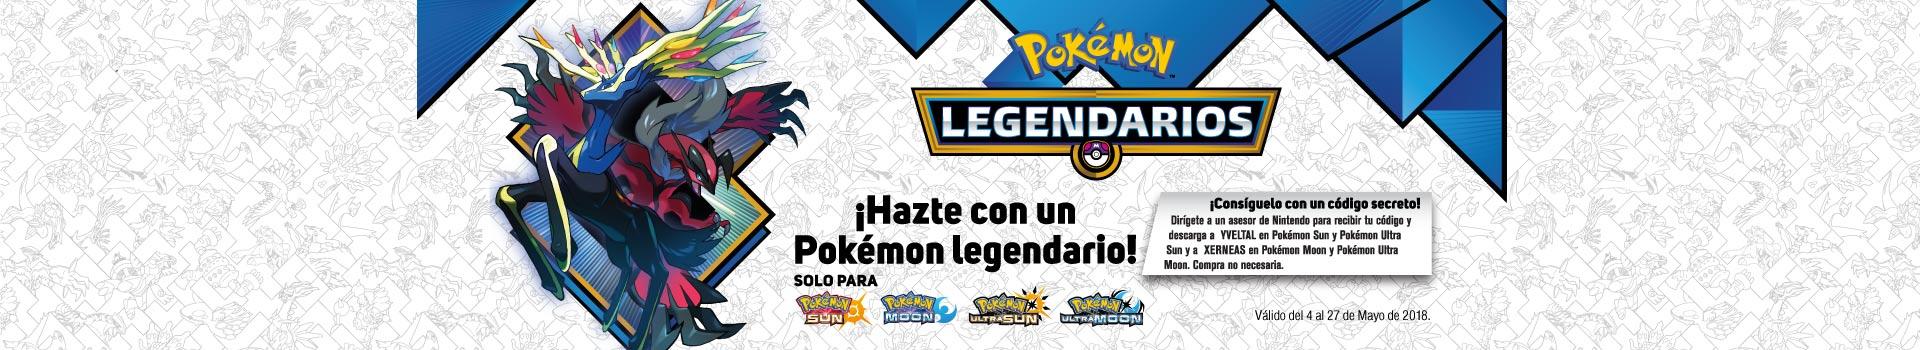 AK-KT-PPAL-12-videojuegos-PP---Nintendo-codigo-pokemon-May15